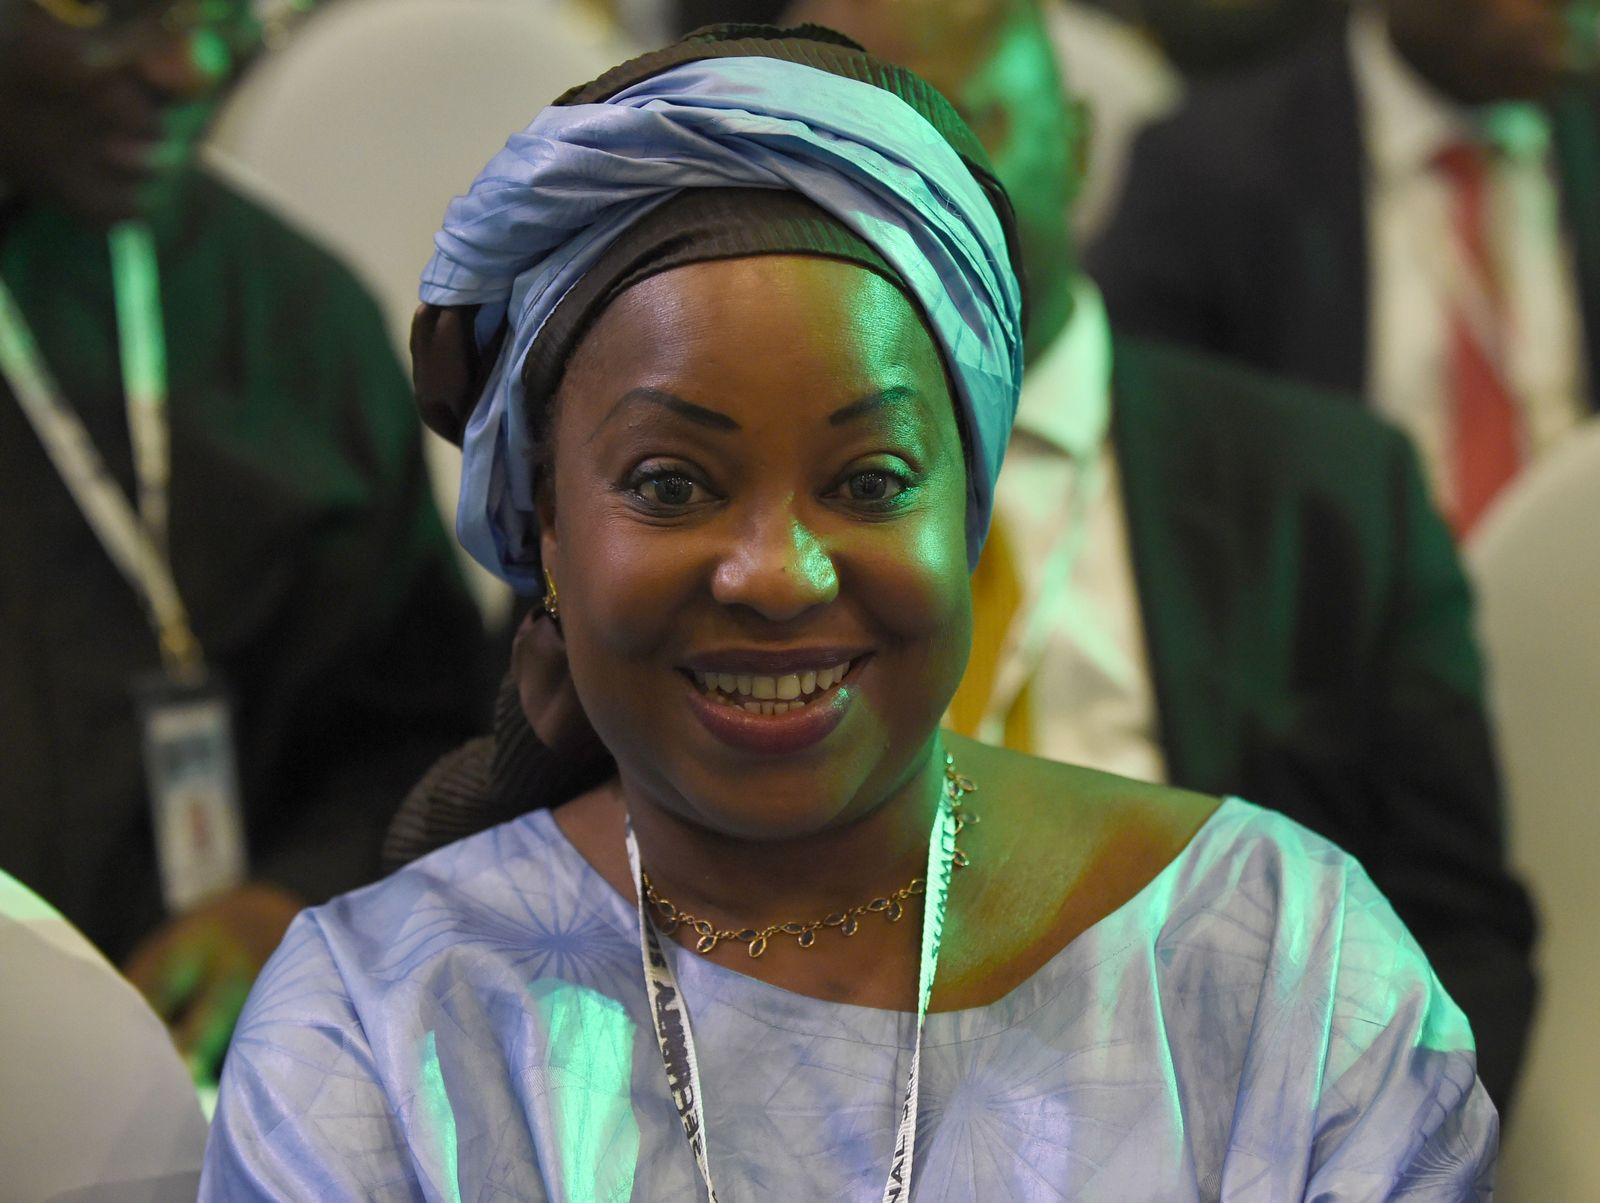 NIGERIA-UNREST-SECURITY-SUMMIT-SAMOURA